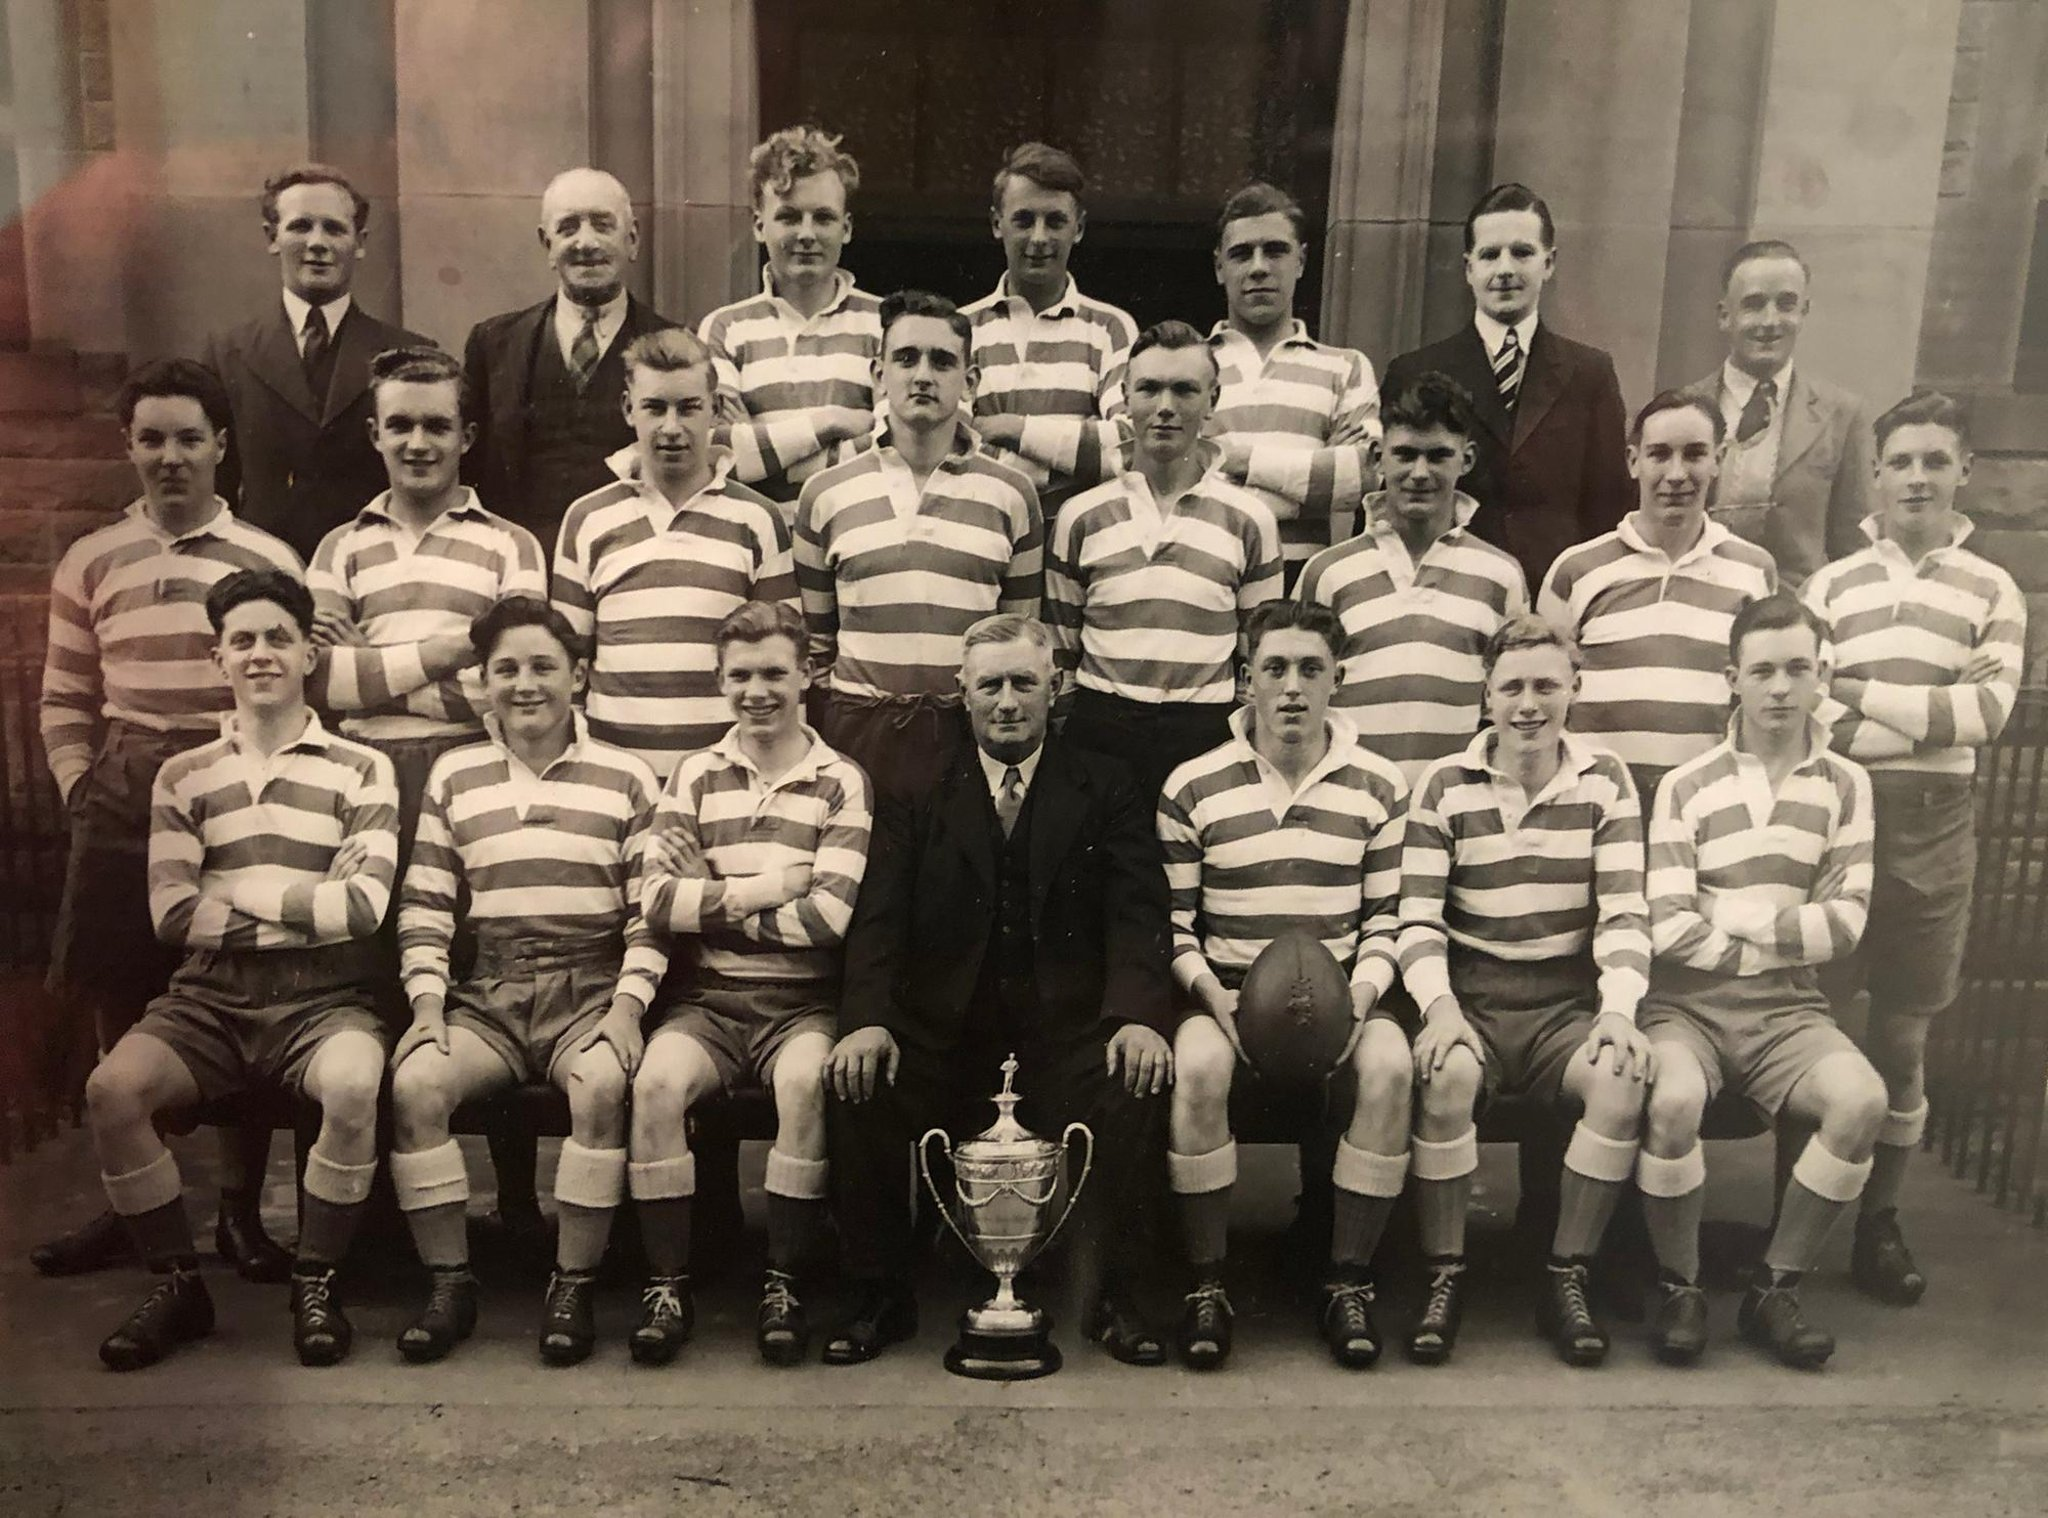 Obituary: Davie Rose, Scottish rugby internationalist